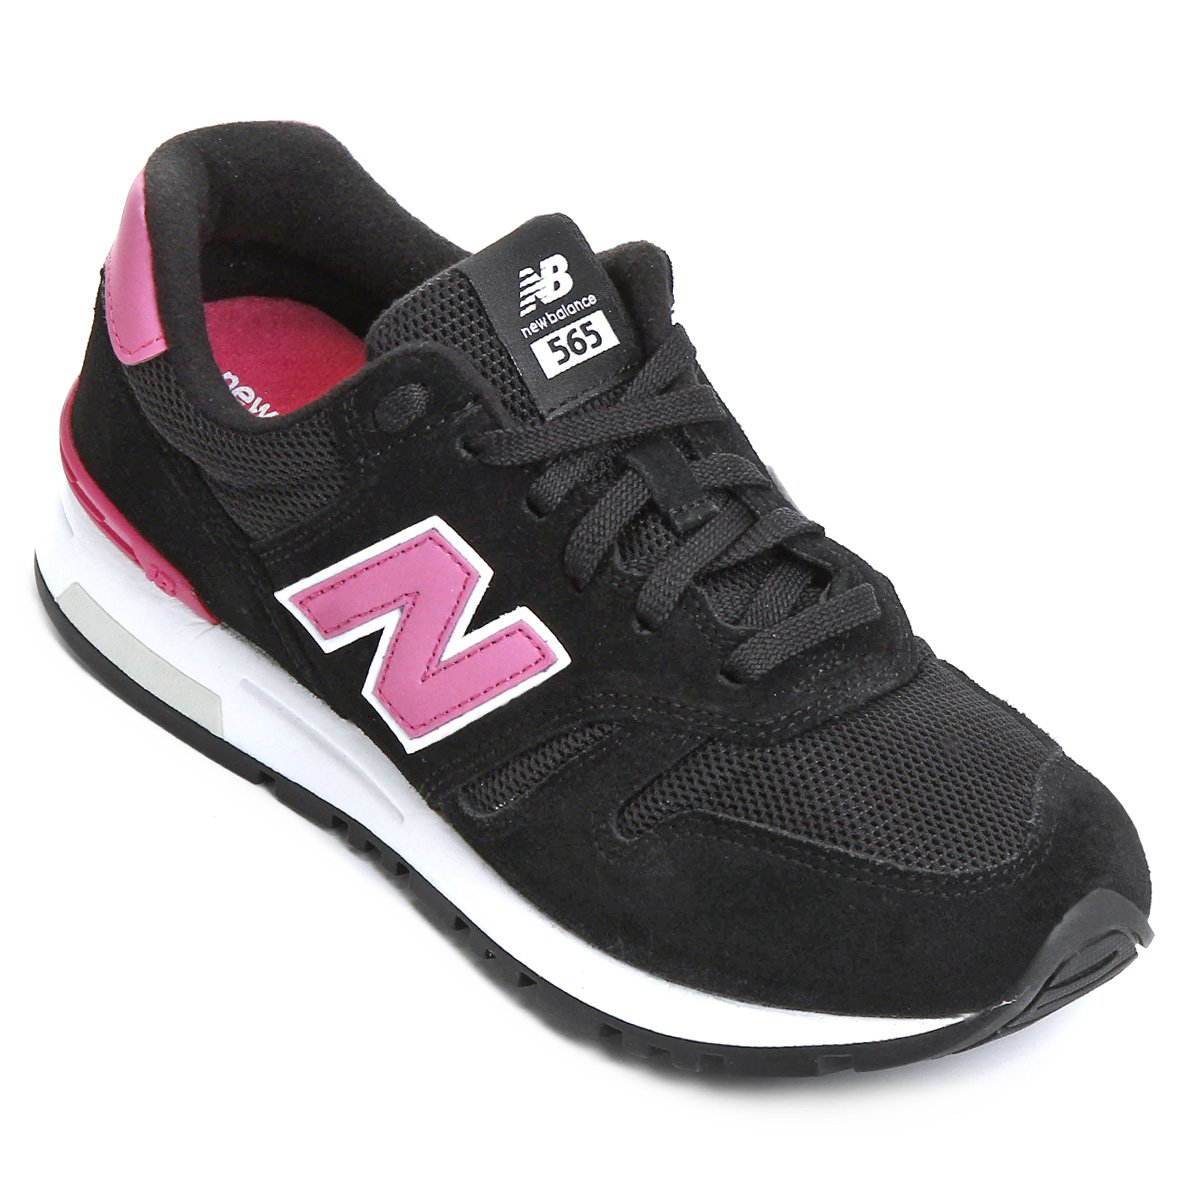 tenis new balance feminino preto e rosa